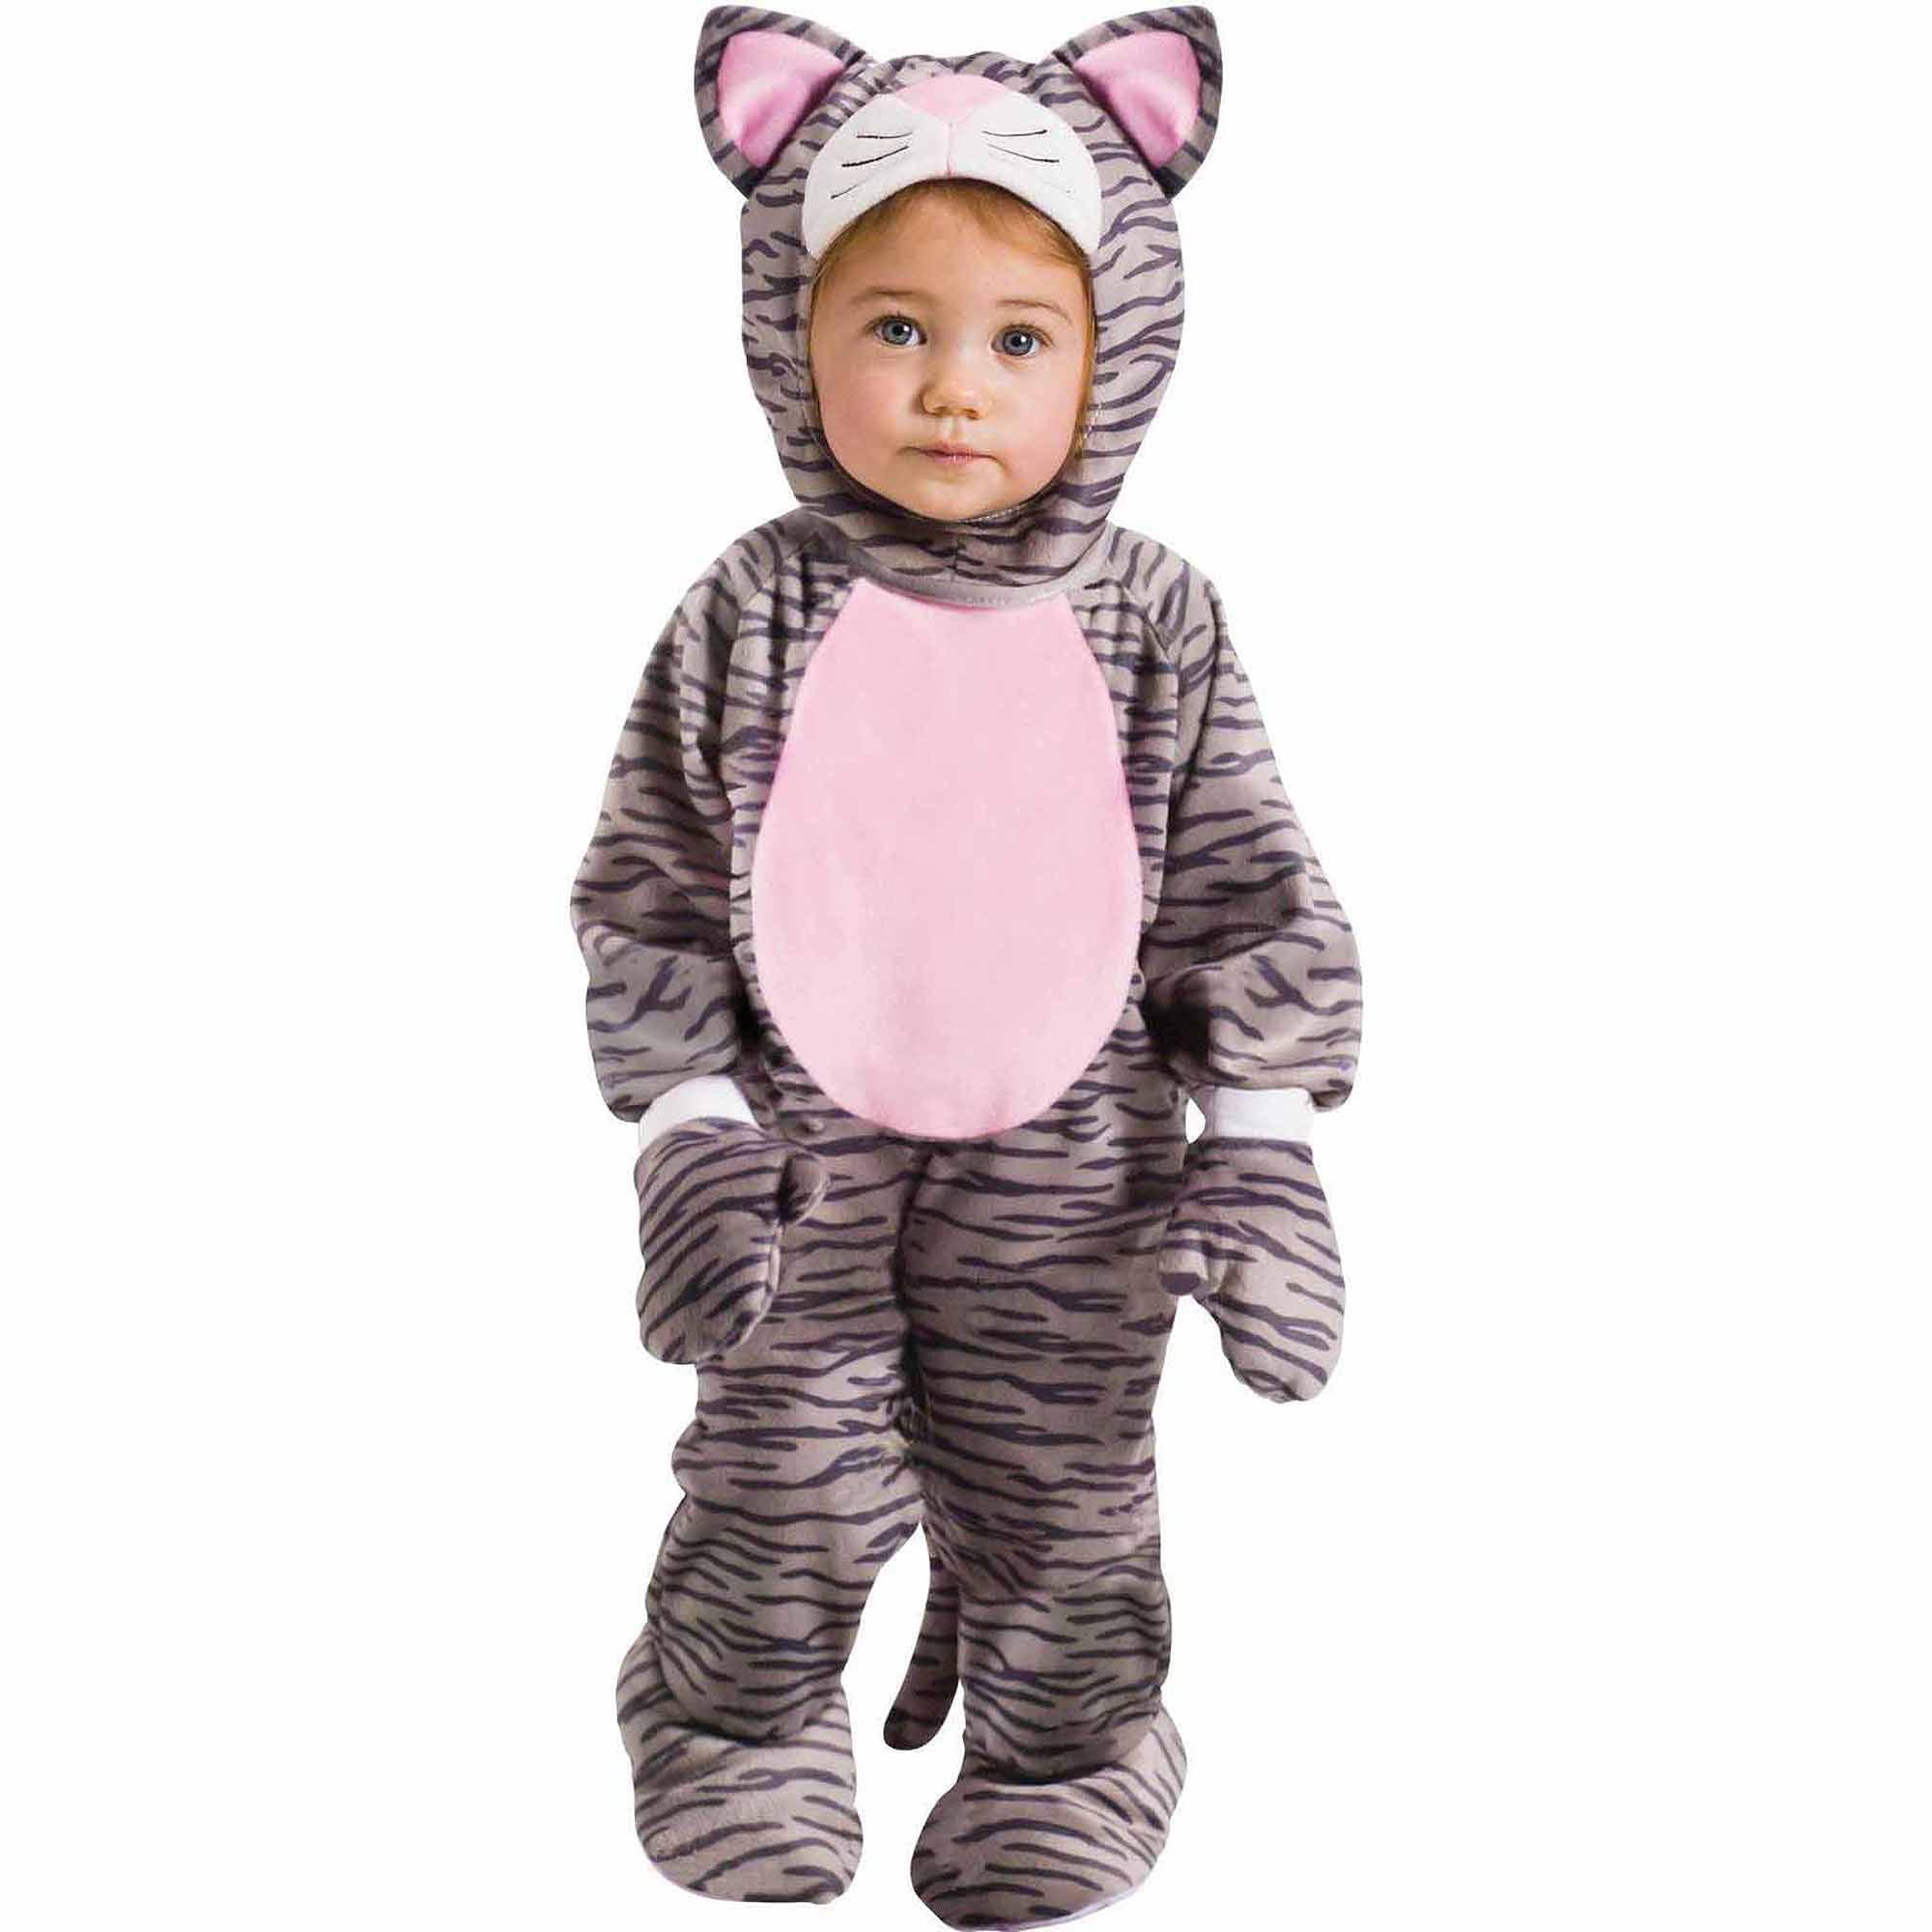 Little Stripe Kitten Infant Halloween Costume